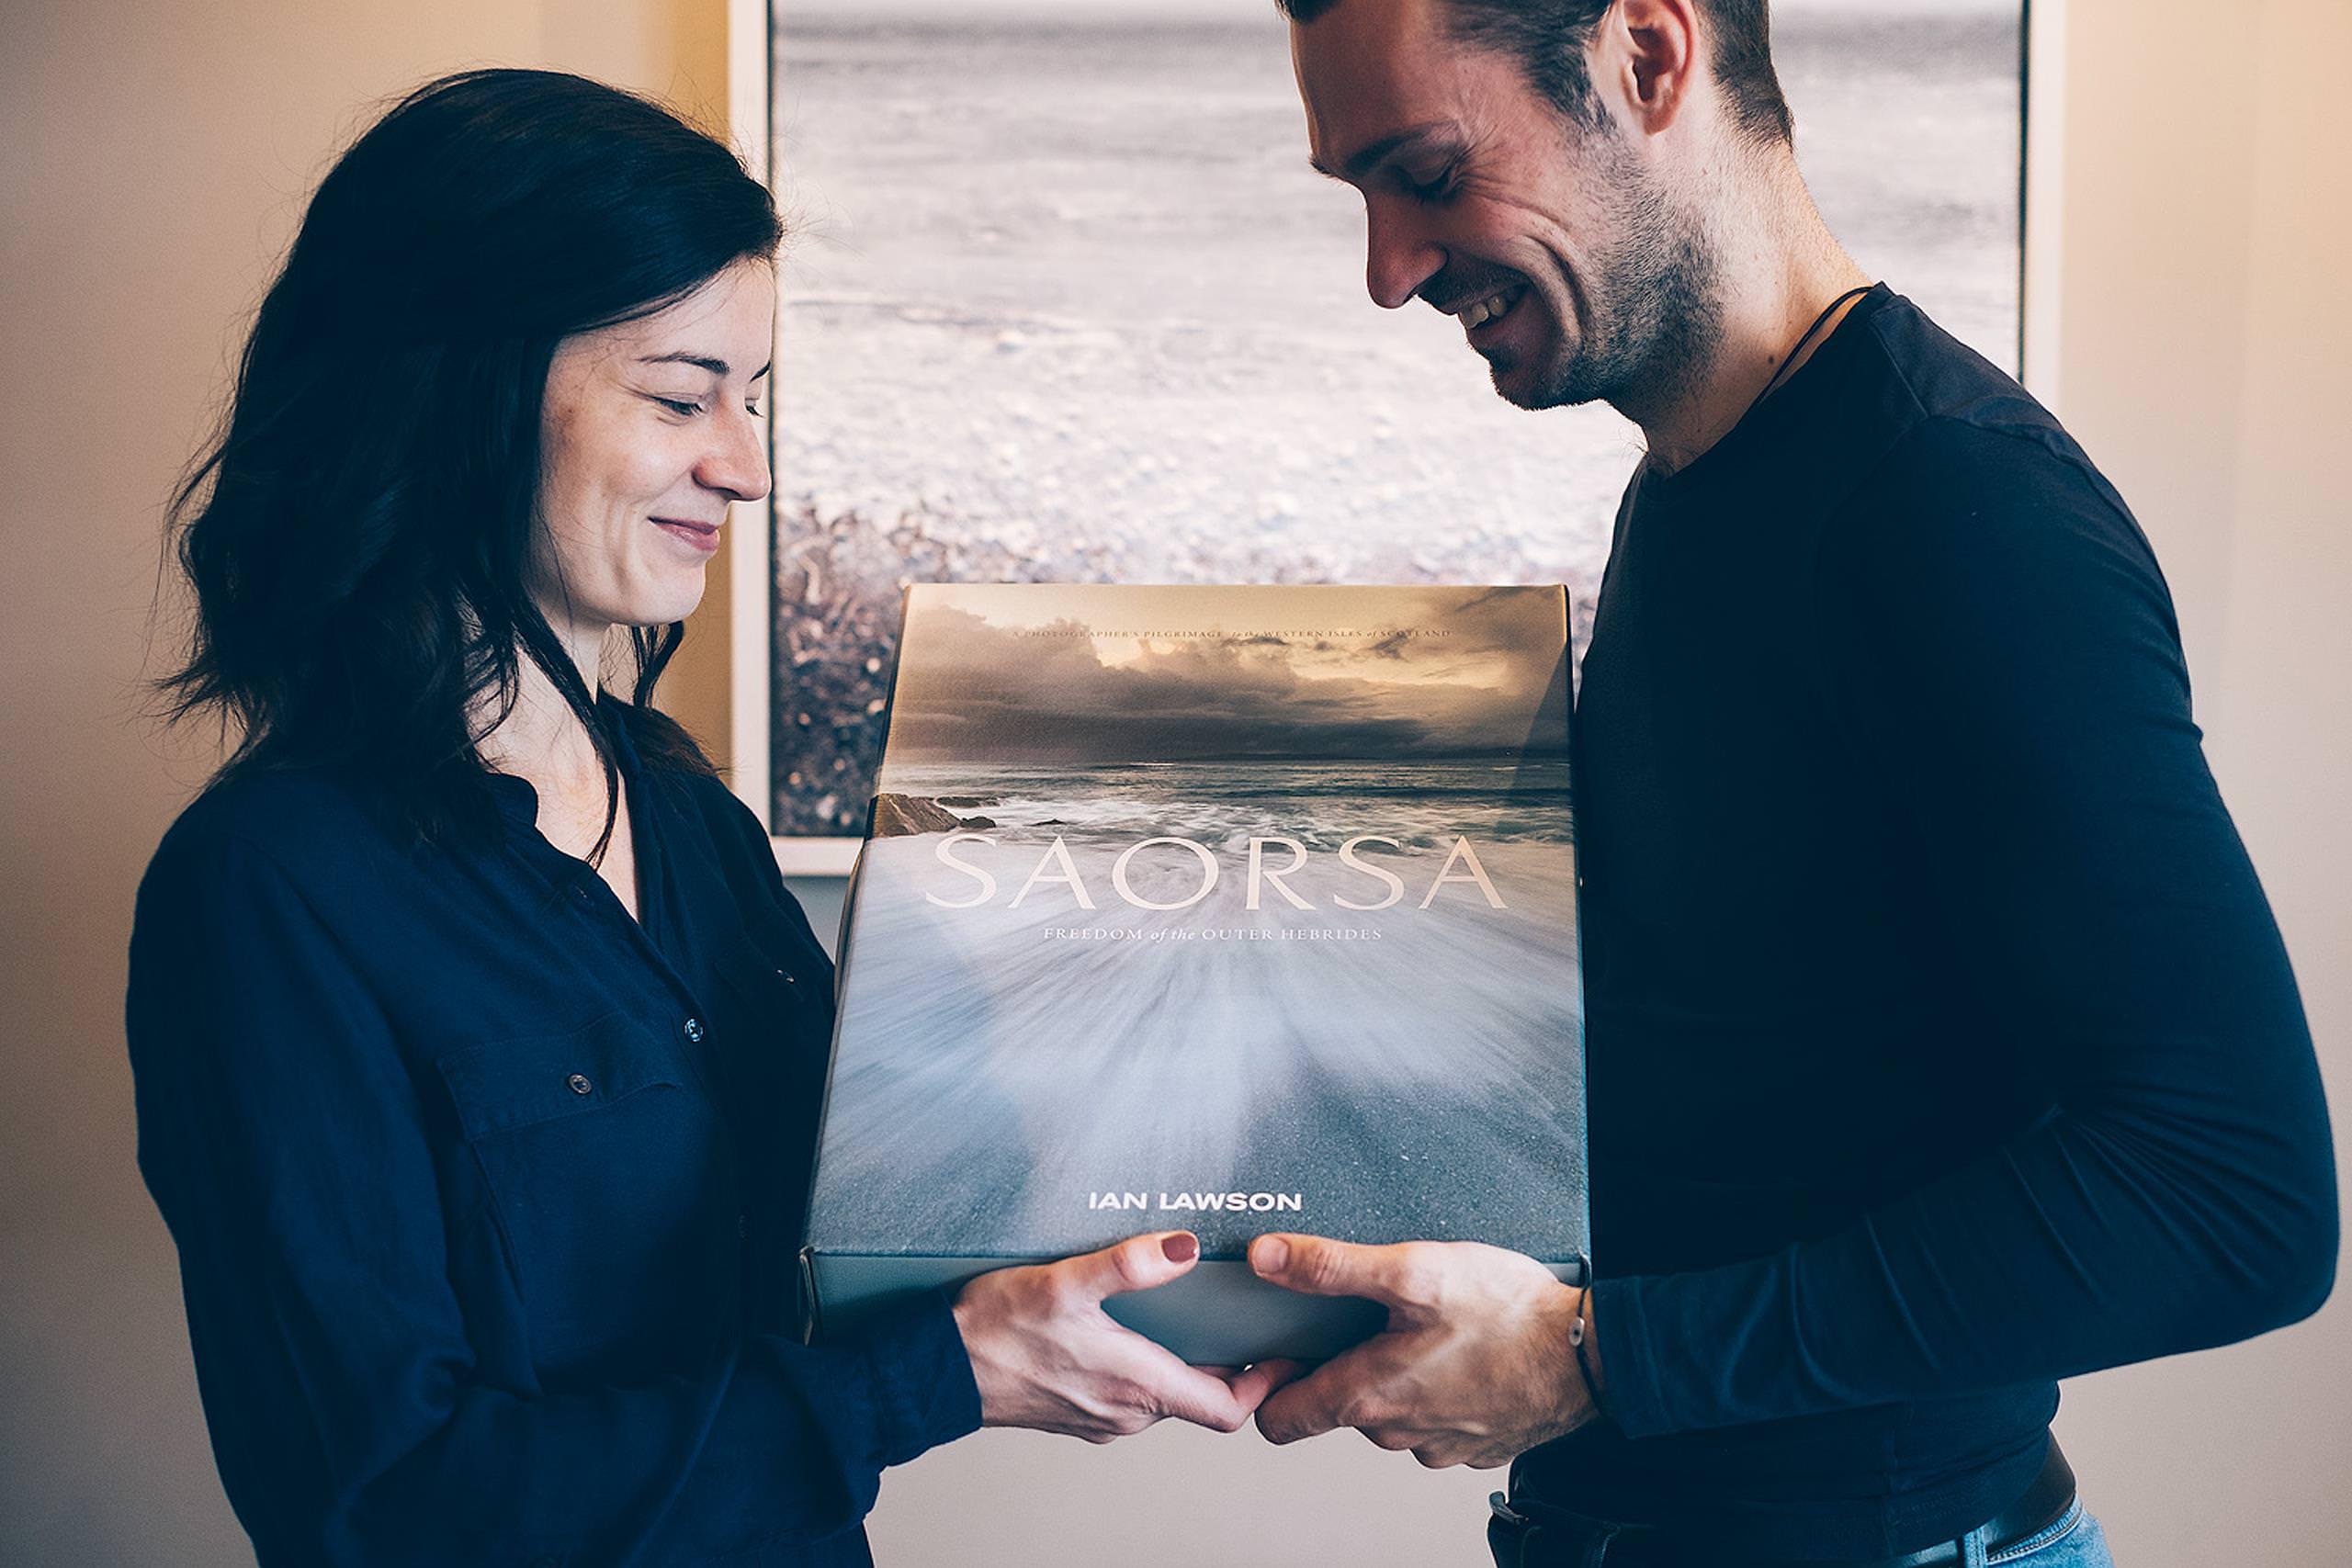 Carolin & Nils Stierand - Saorsa Book